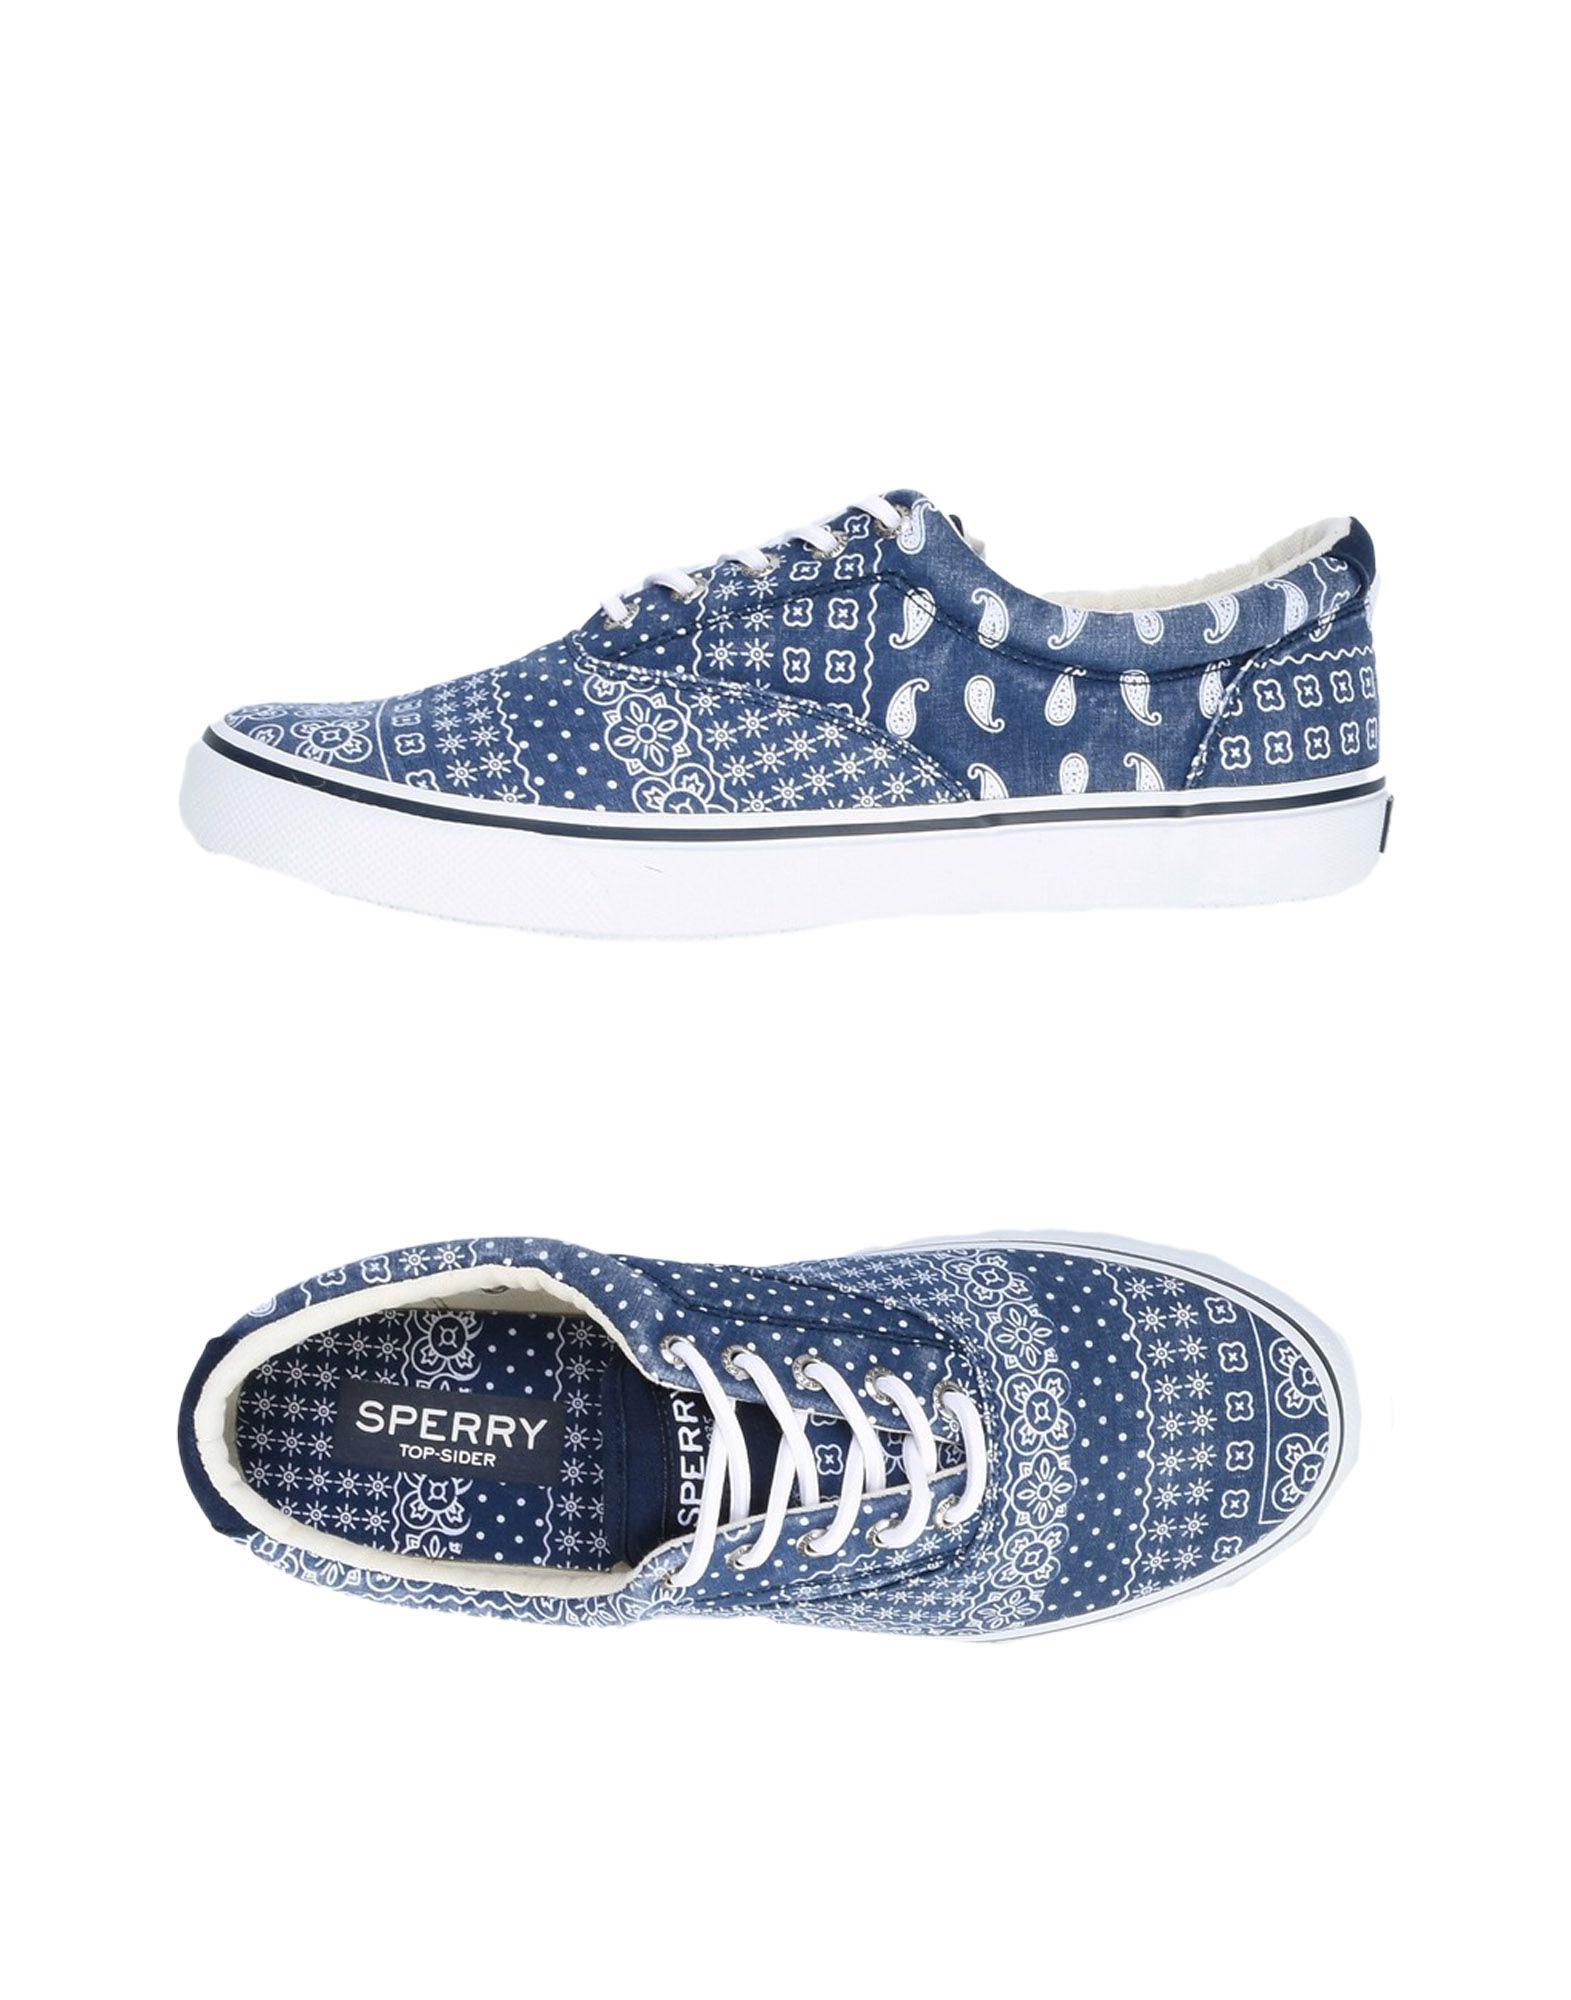 Sneakers Sperry Top-Sider Striper Ll Cvo Bandana - Uomo - 11265535FM